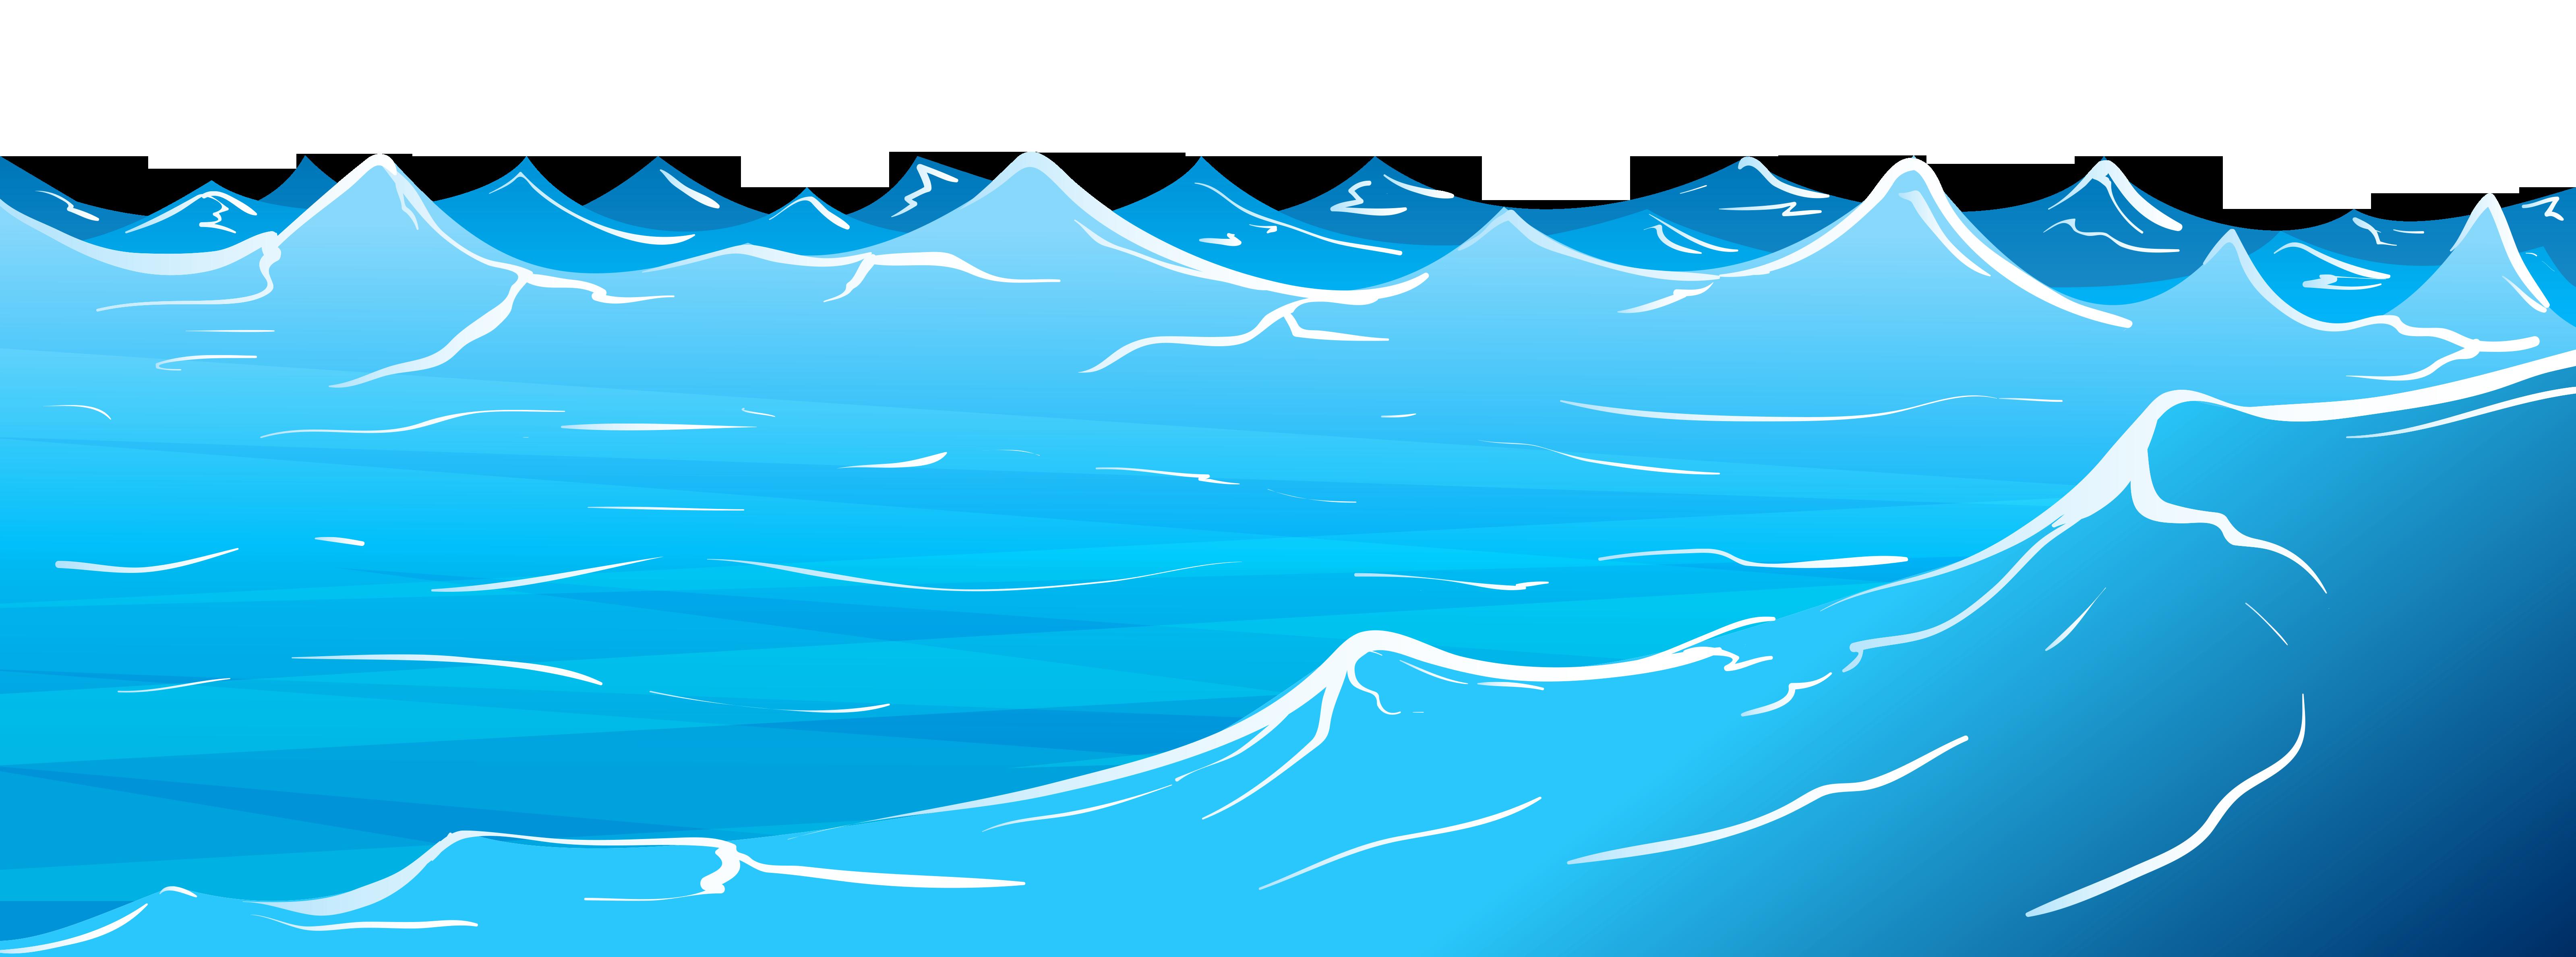 in ocean water earth